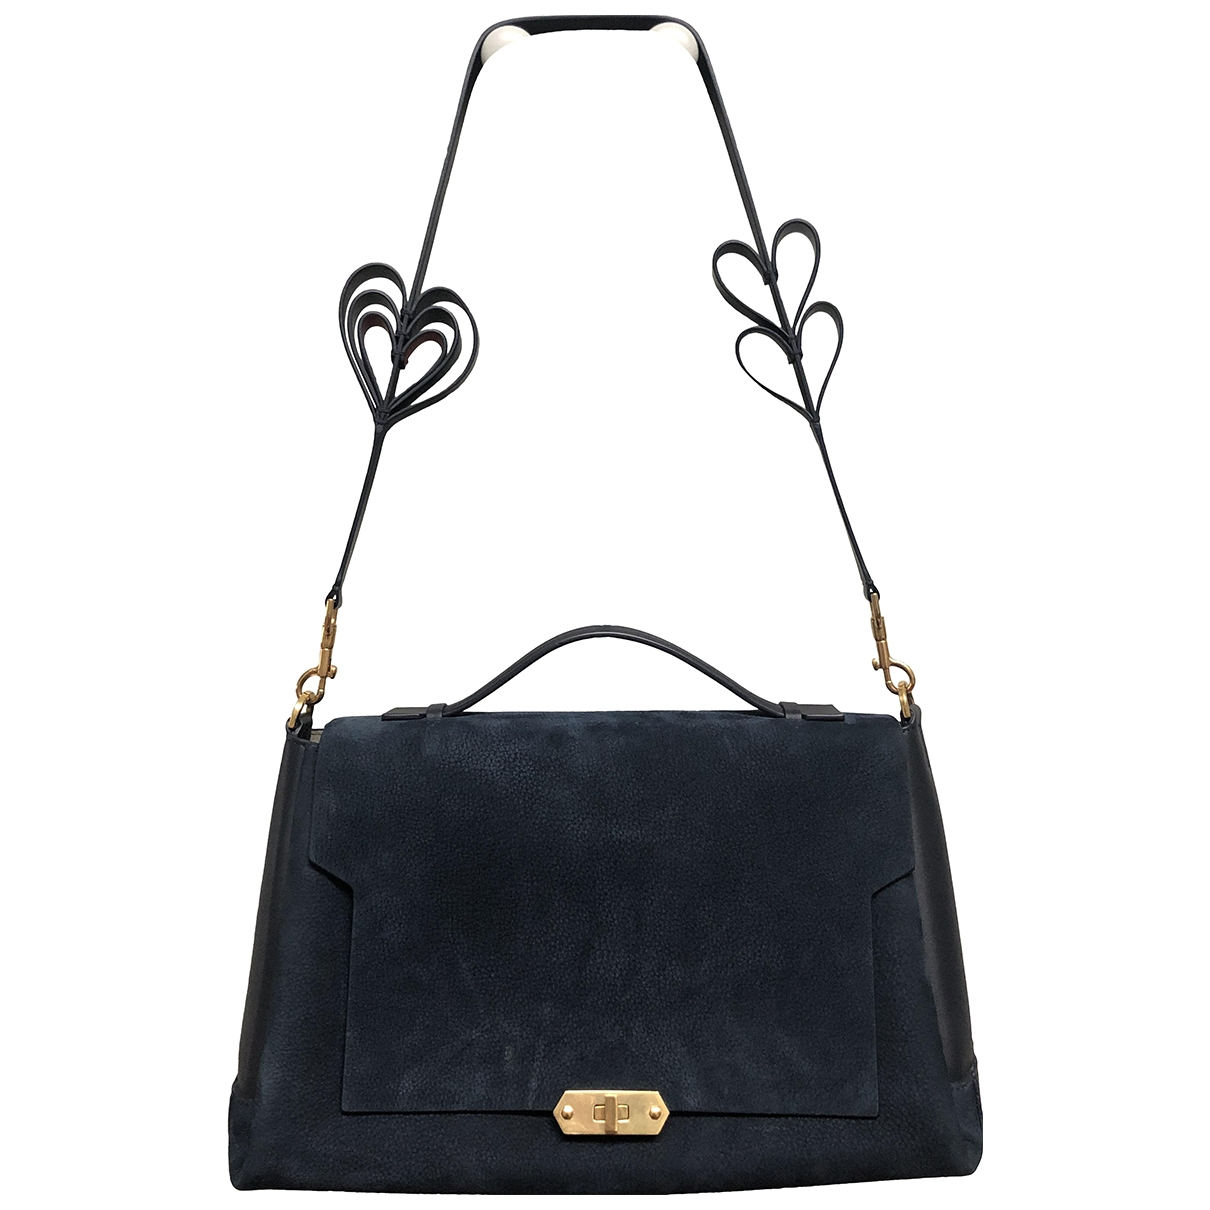 Anya Hindmarch \N Navy Leather handbag for Women \N